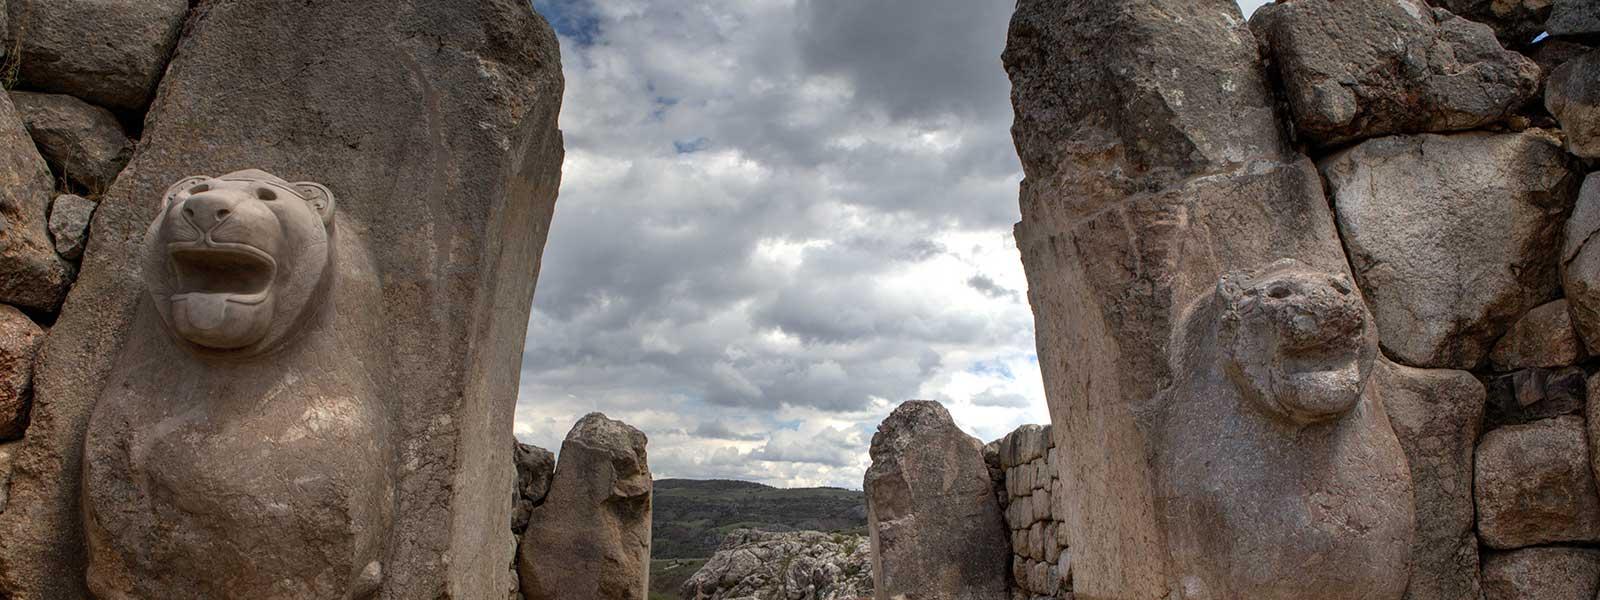 Hattusa, The Capital of Hittites in Bogazkoy, Corum